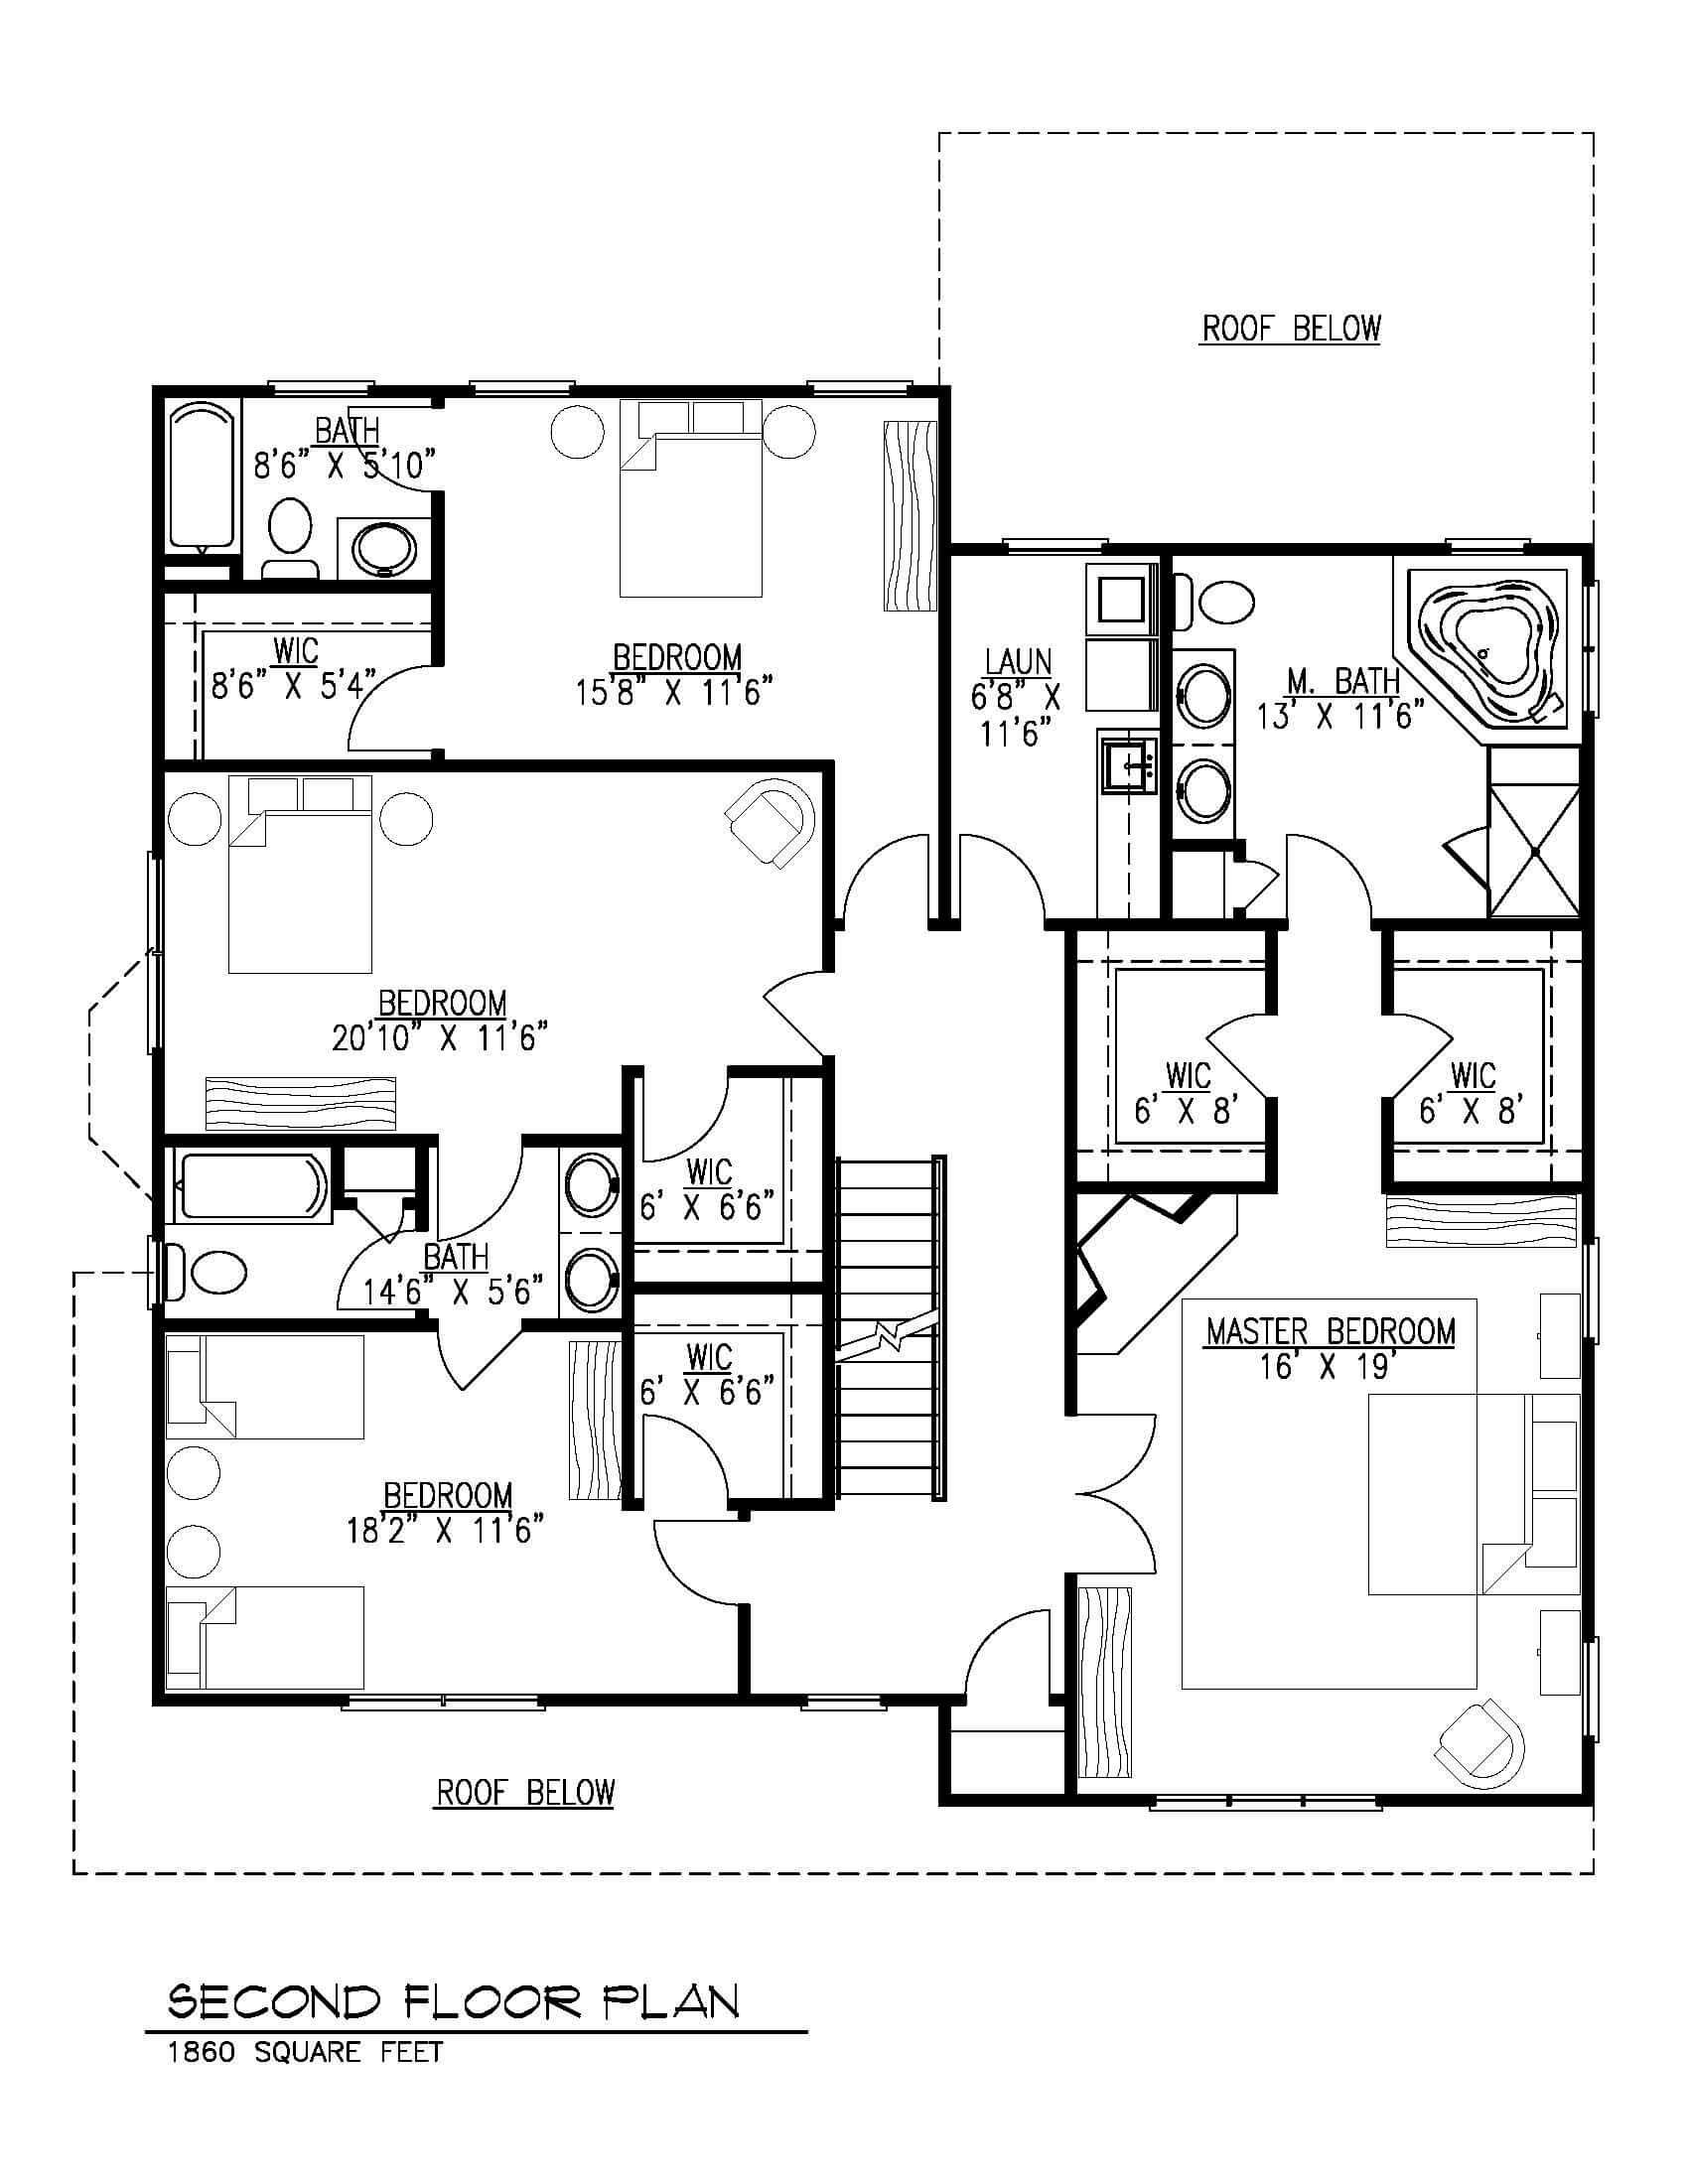 129 Brightwood Second Floor B&W